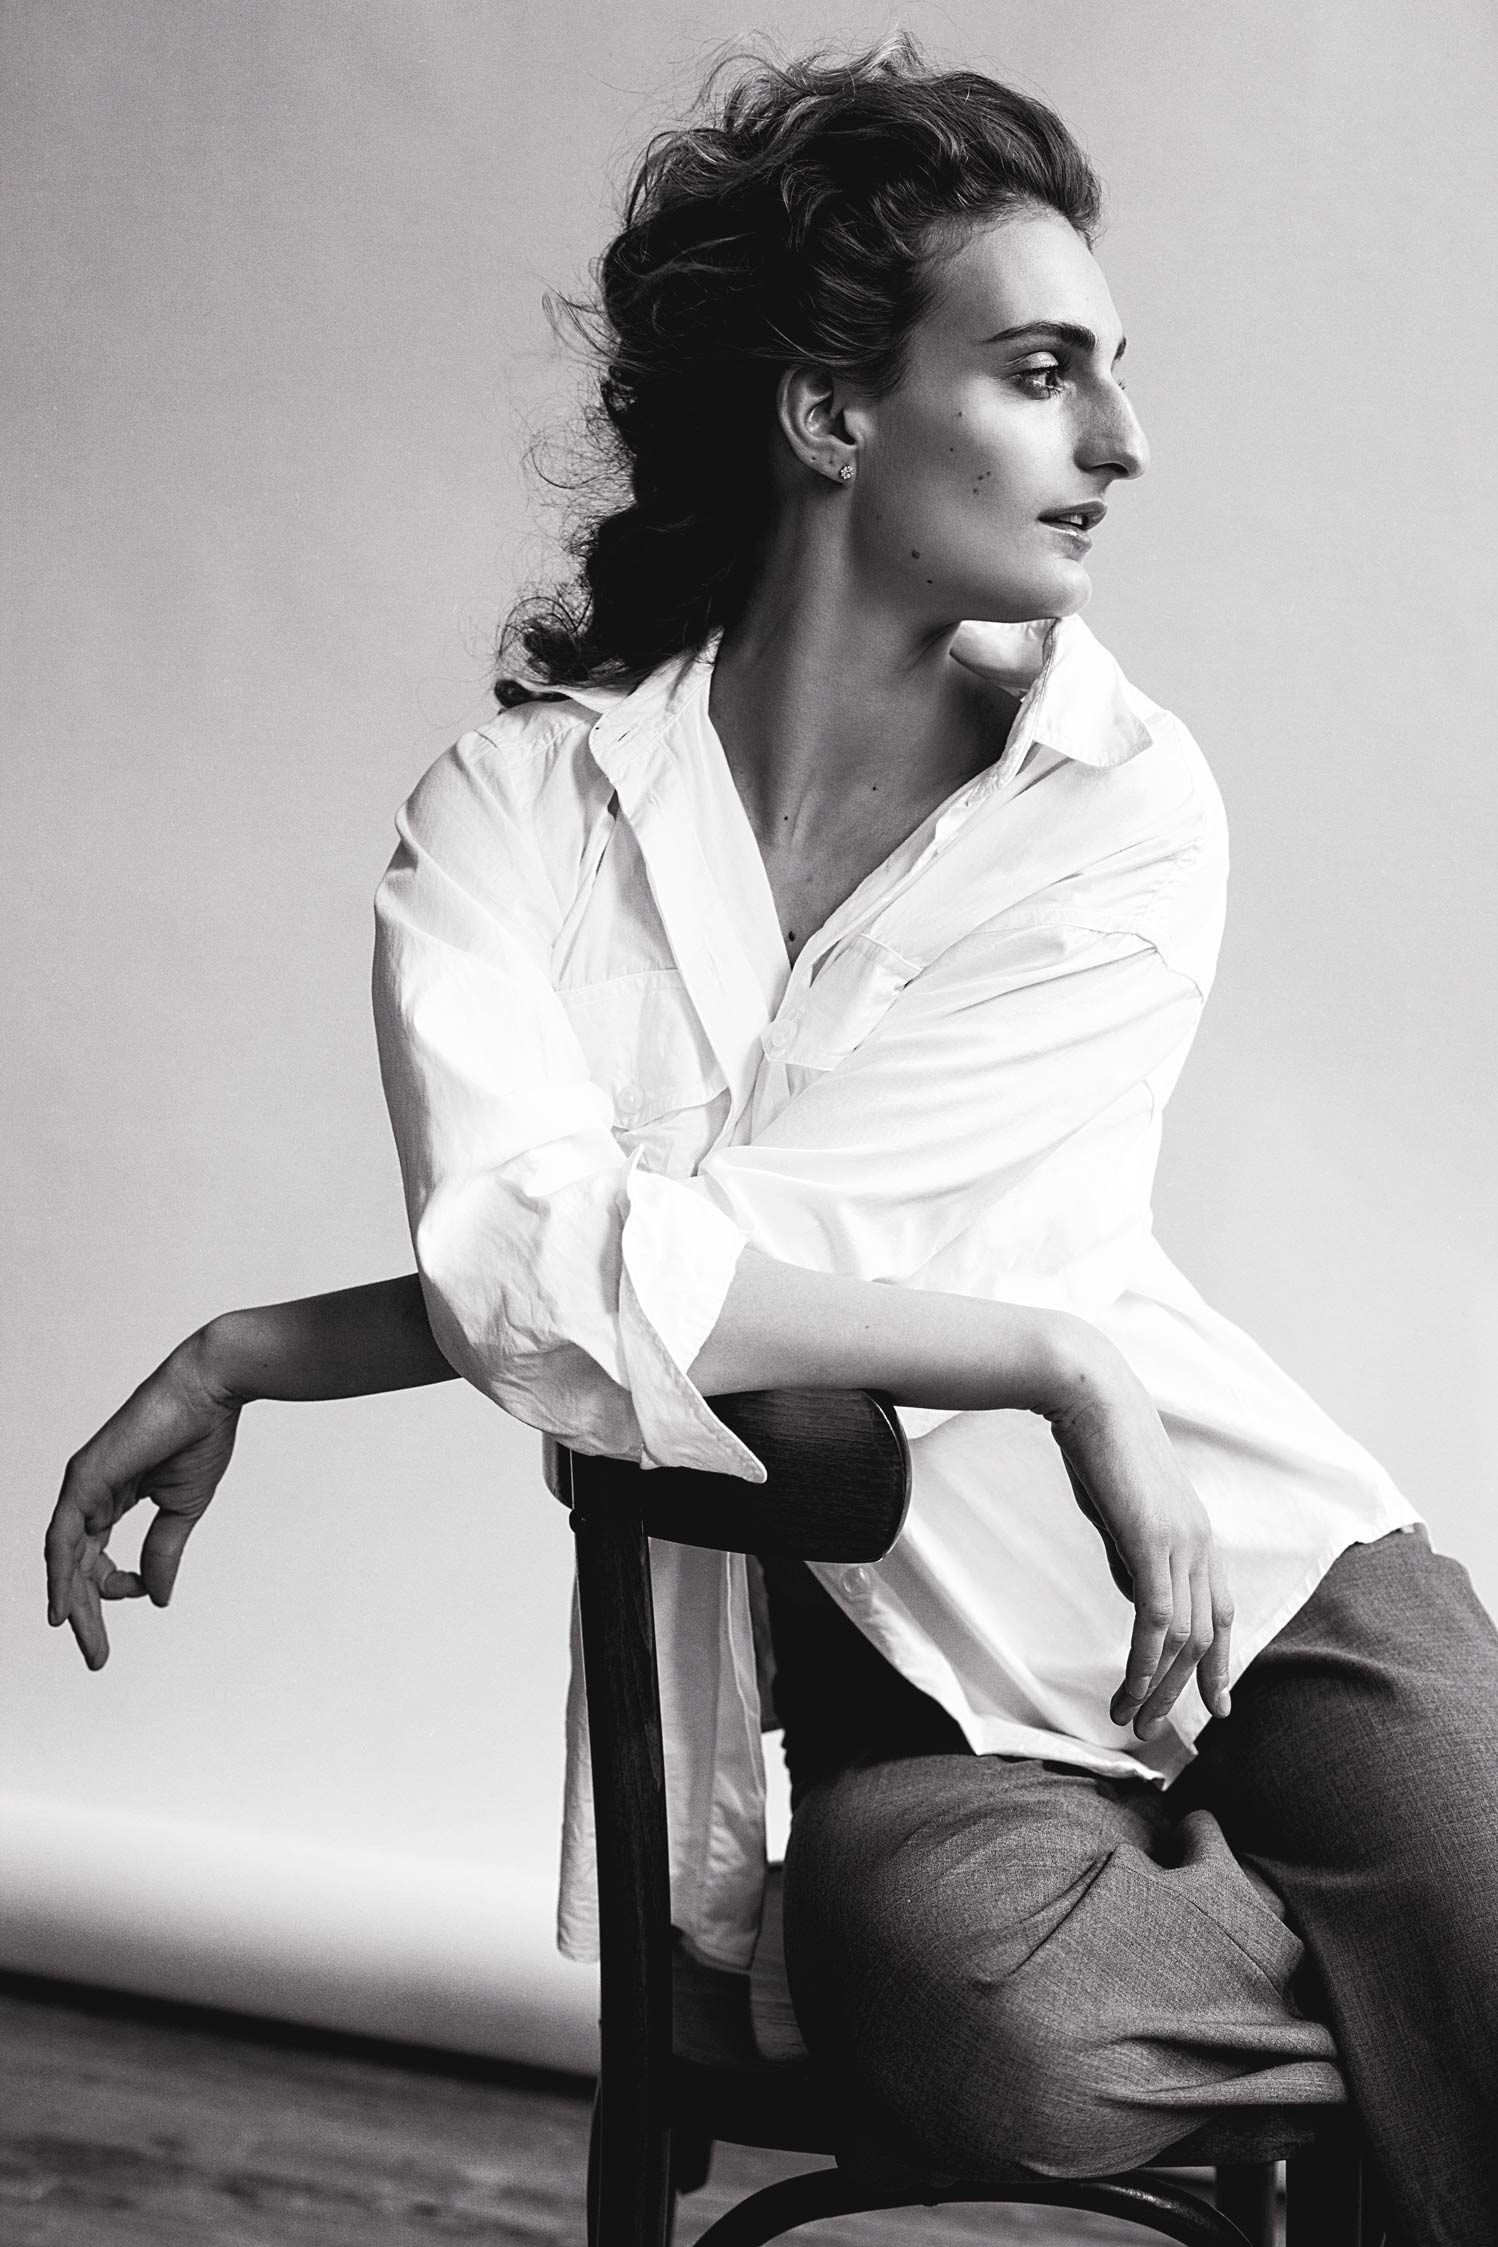 Studio photographie Montréal, séance photo mode editorial creative avec athlète olympique Gabriella papadakis.